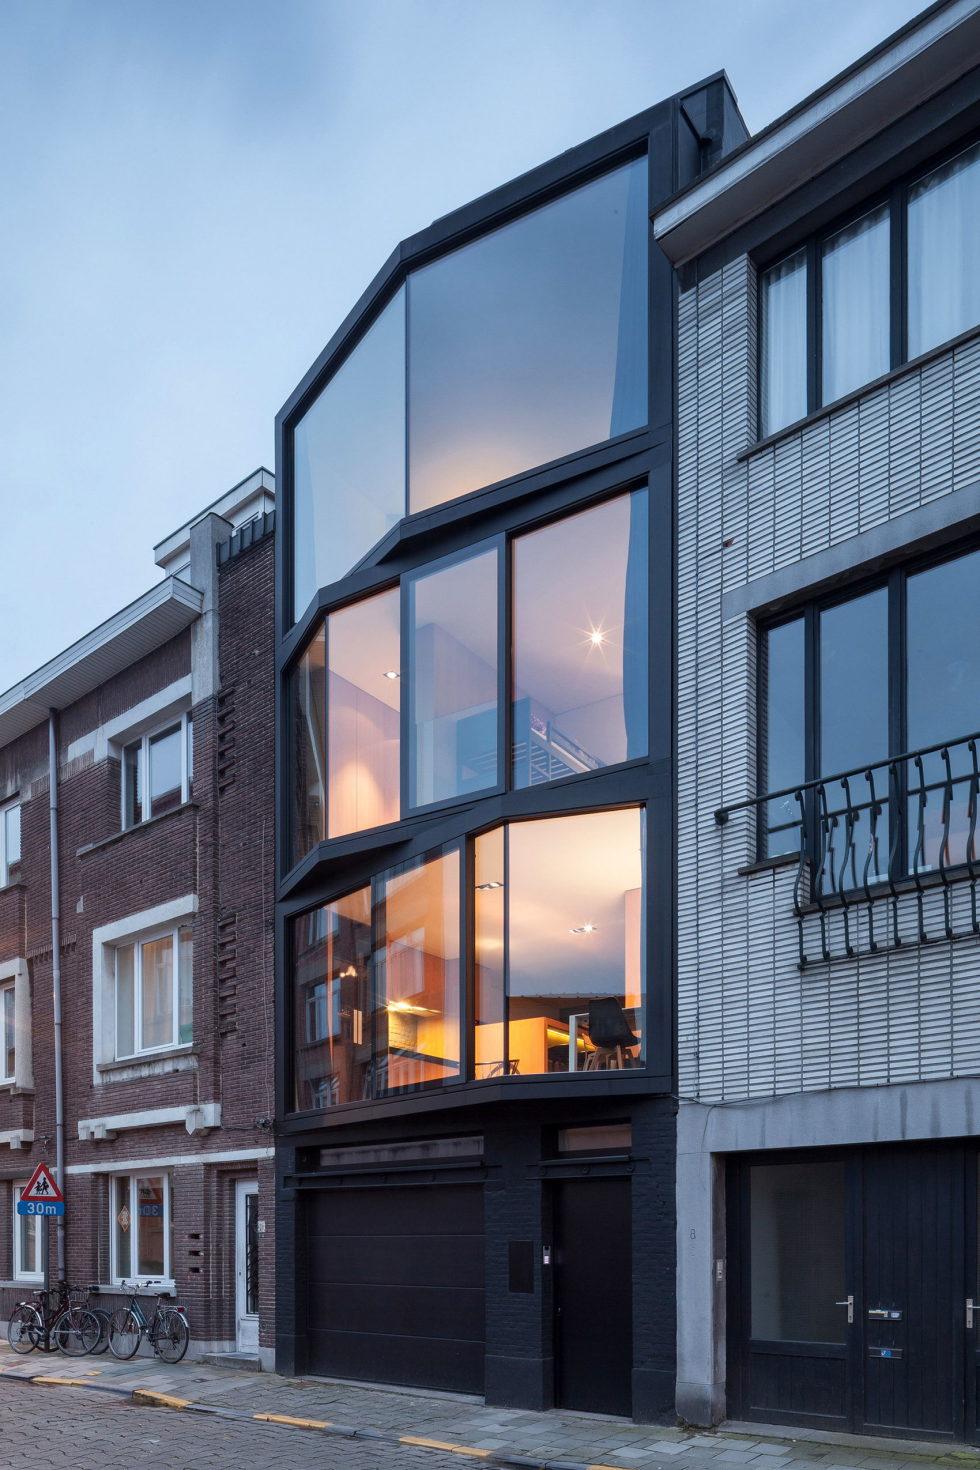 The House With Polyangular Glass Facade In Belgium 2